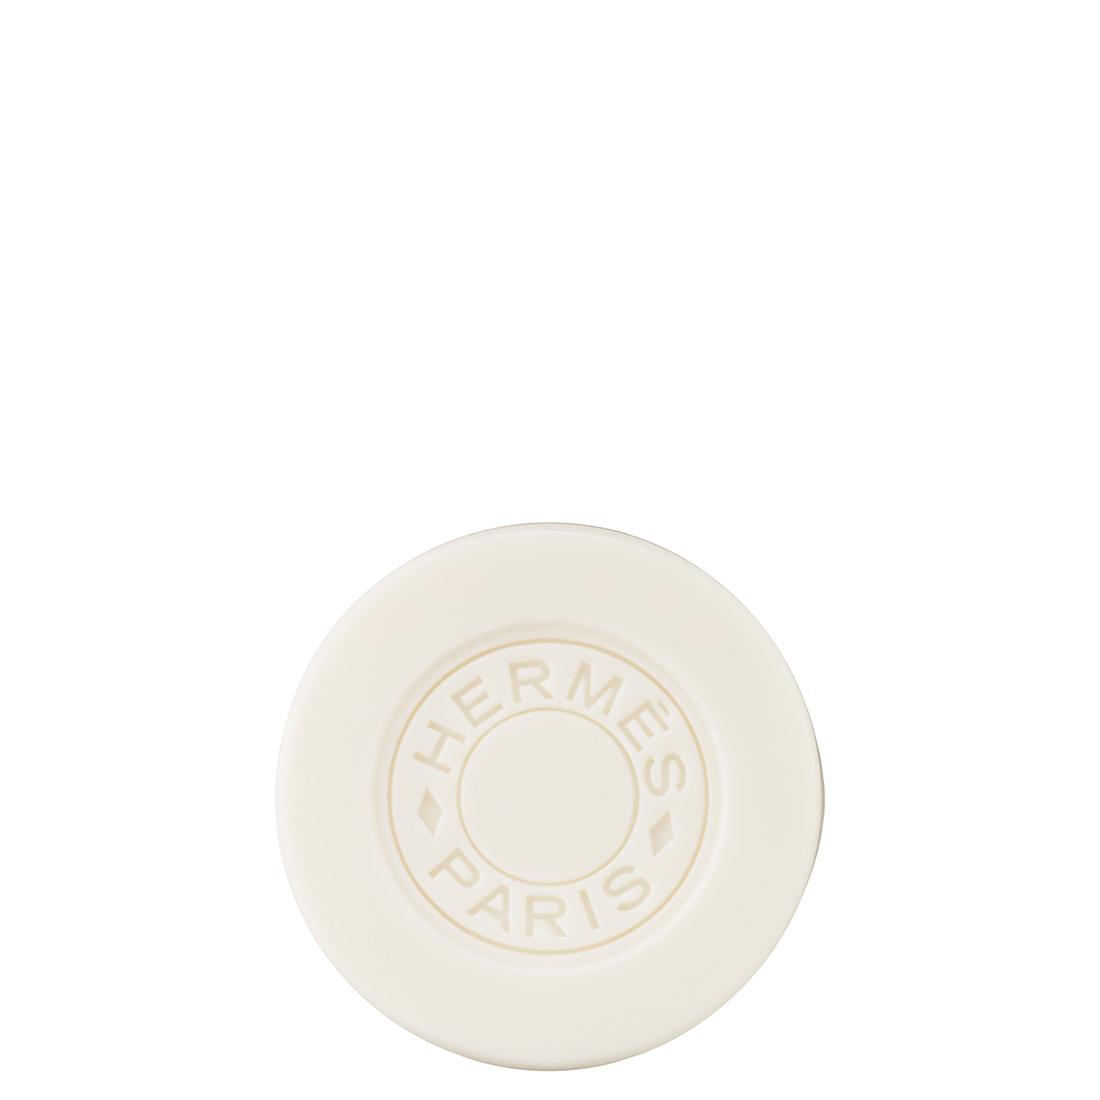 Hermès - Calèche - Savon parfumé